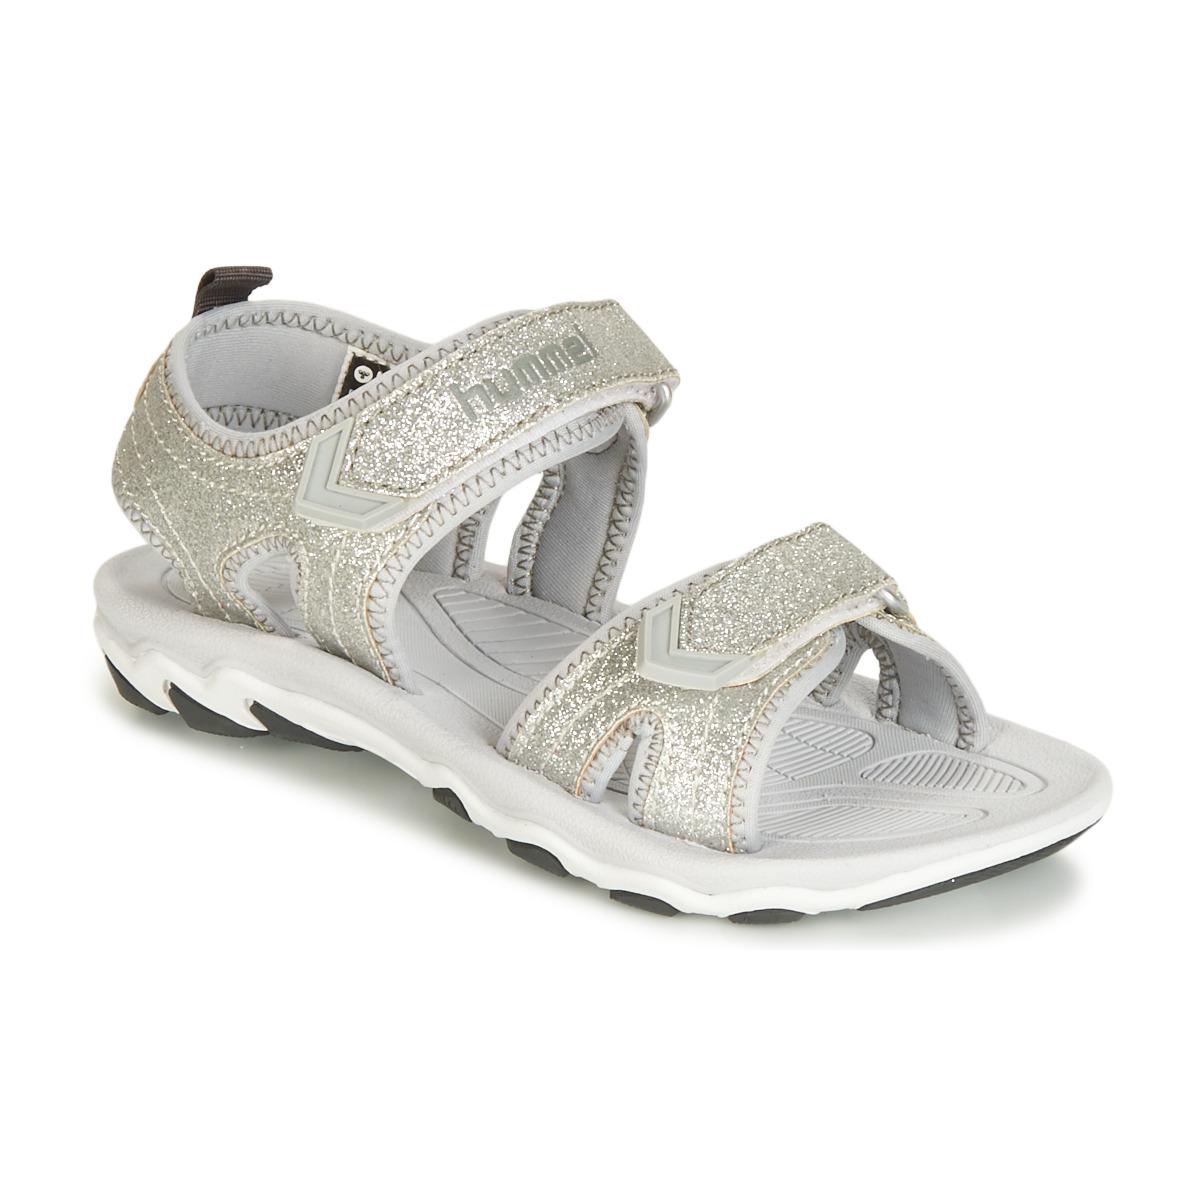 064e6a25 Sko og støvler - Sandaler - Hummel til børn